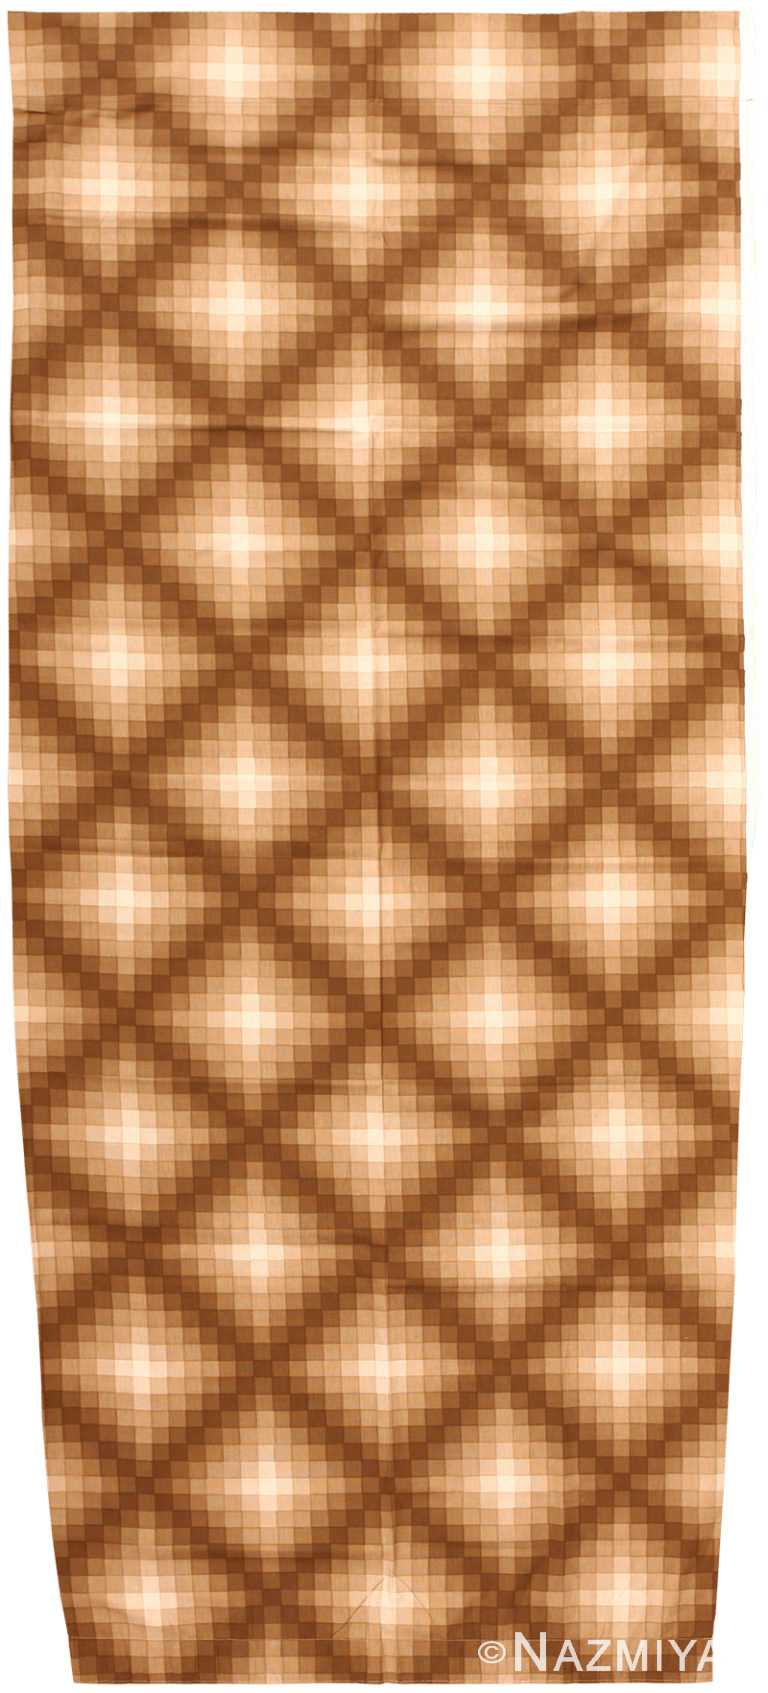 Vintage Scandinavian Verner Panton Checkers II Textile 47838 by Nazmiyal NYC